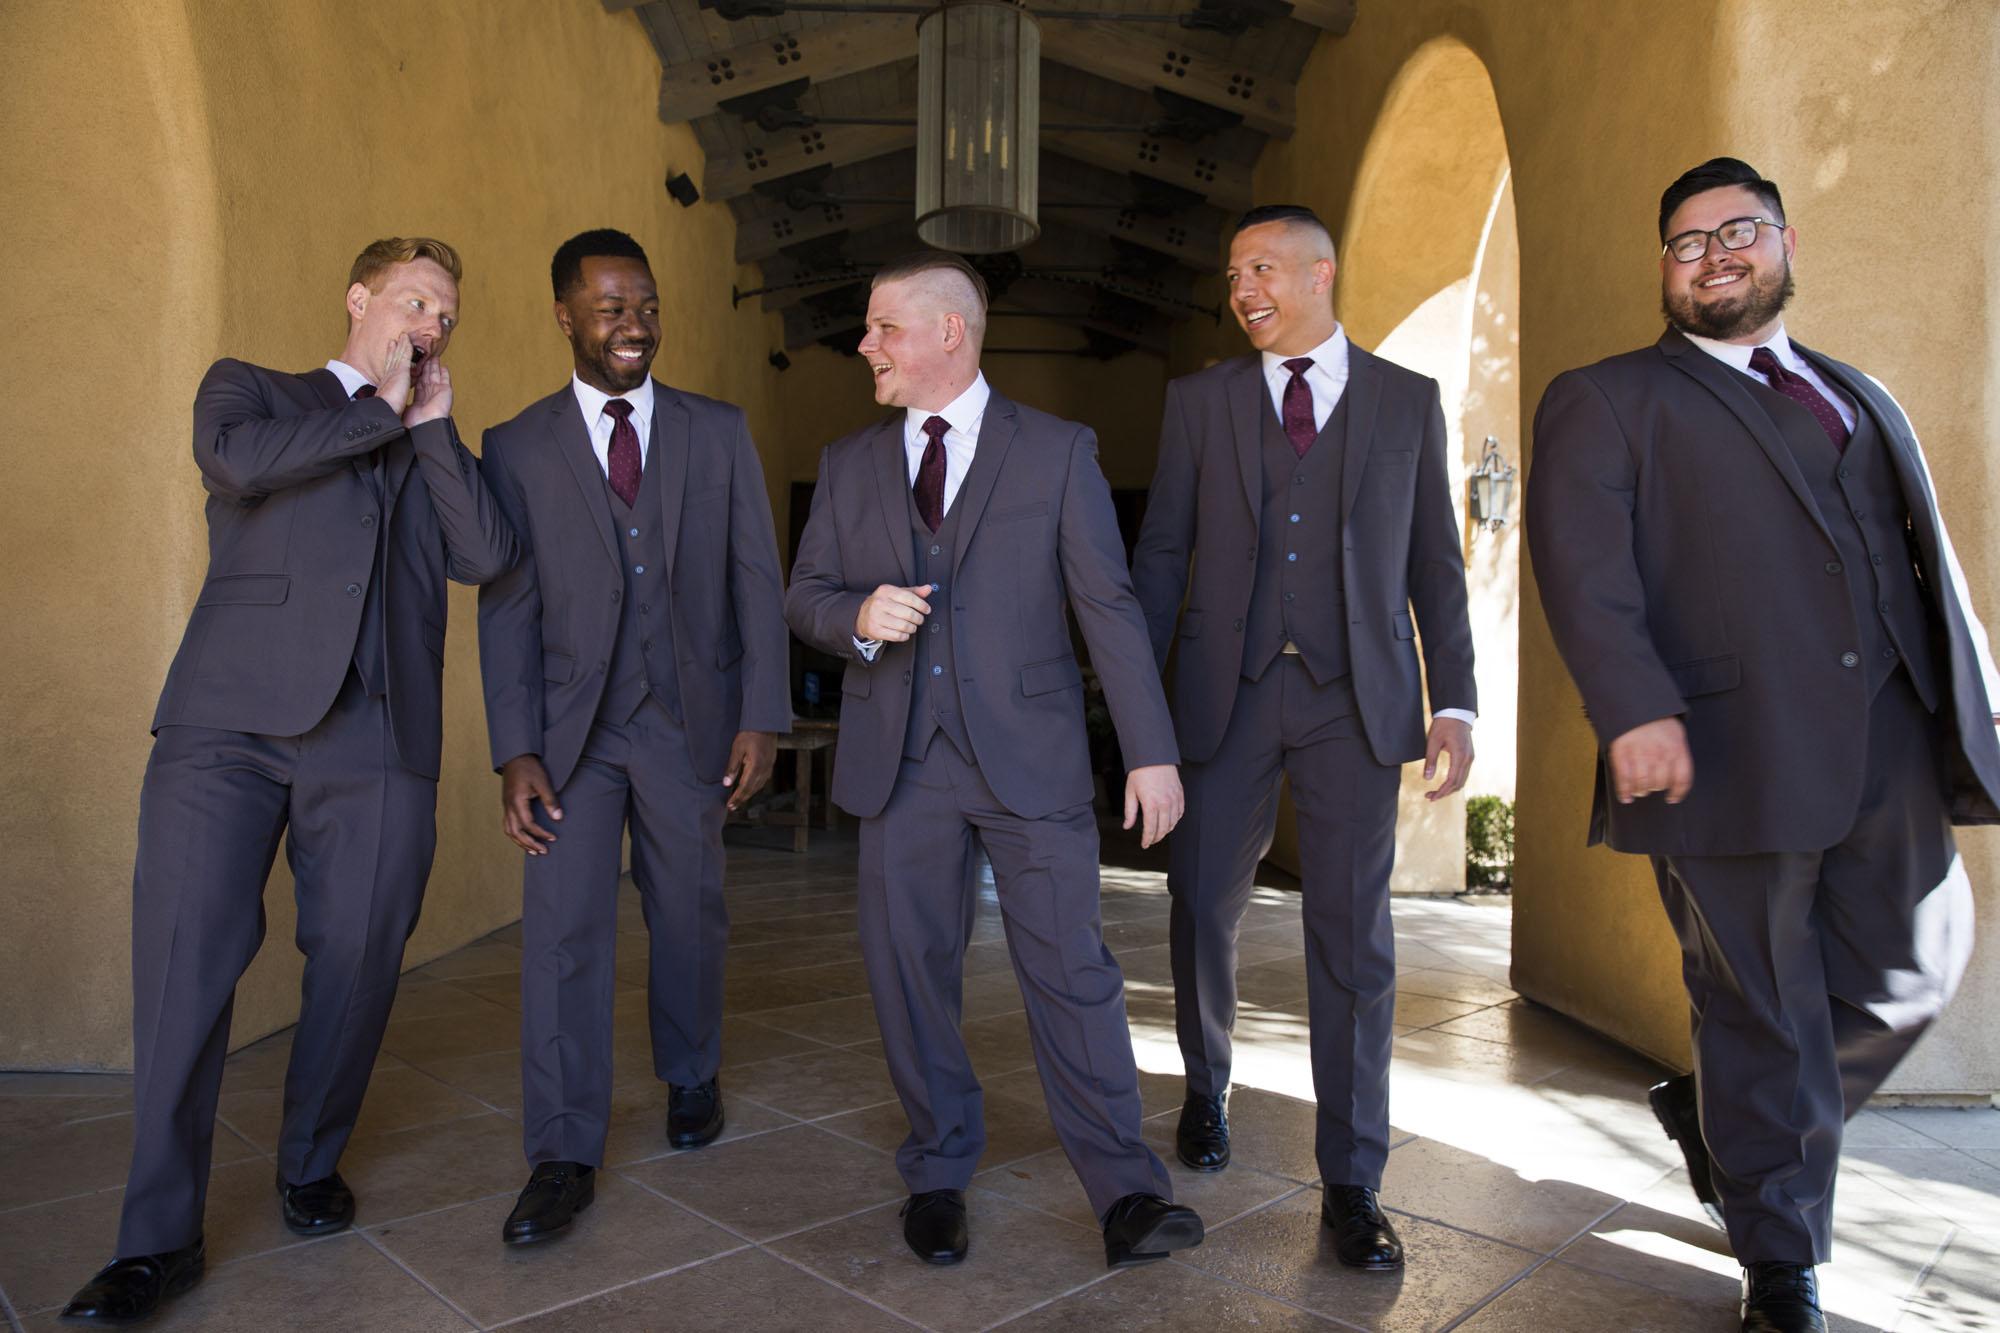 Funny groomsmen grey and purple